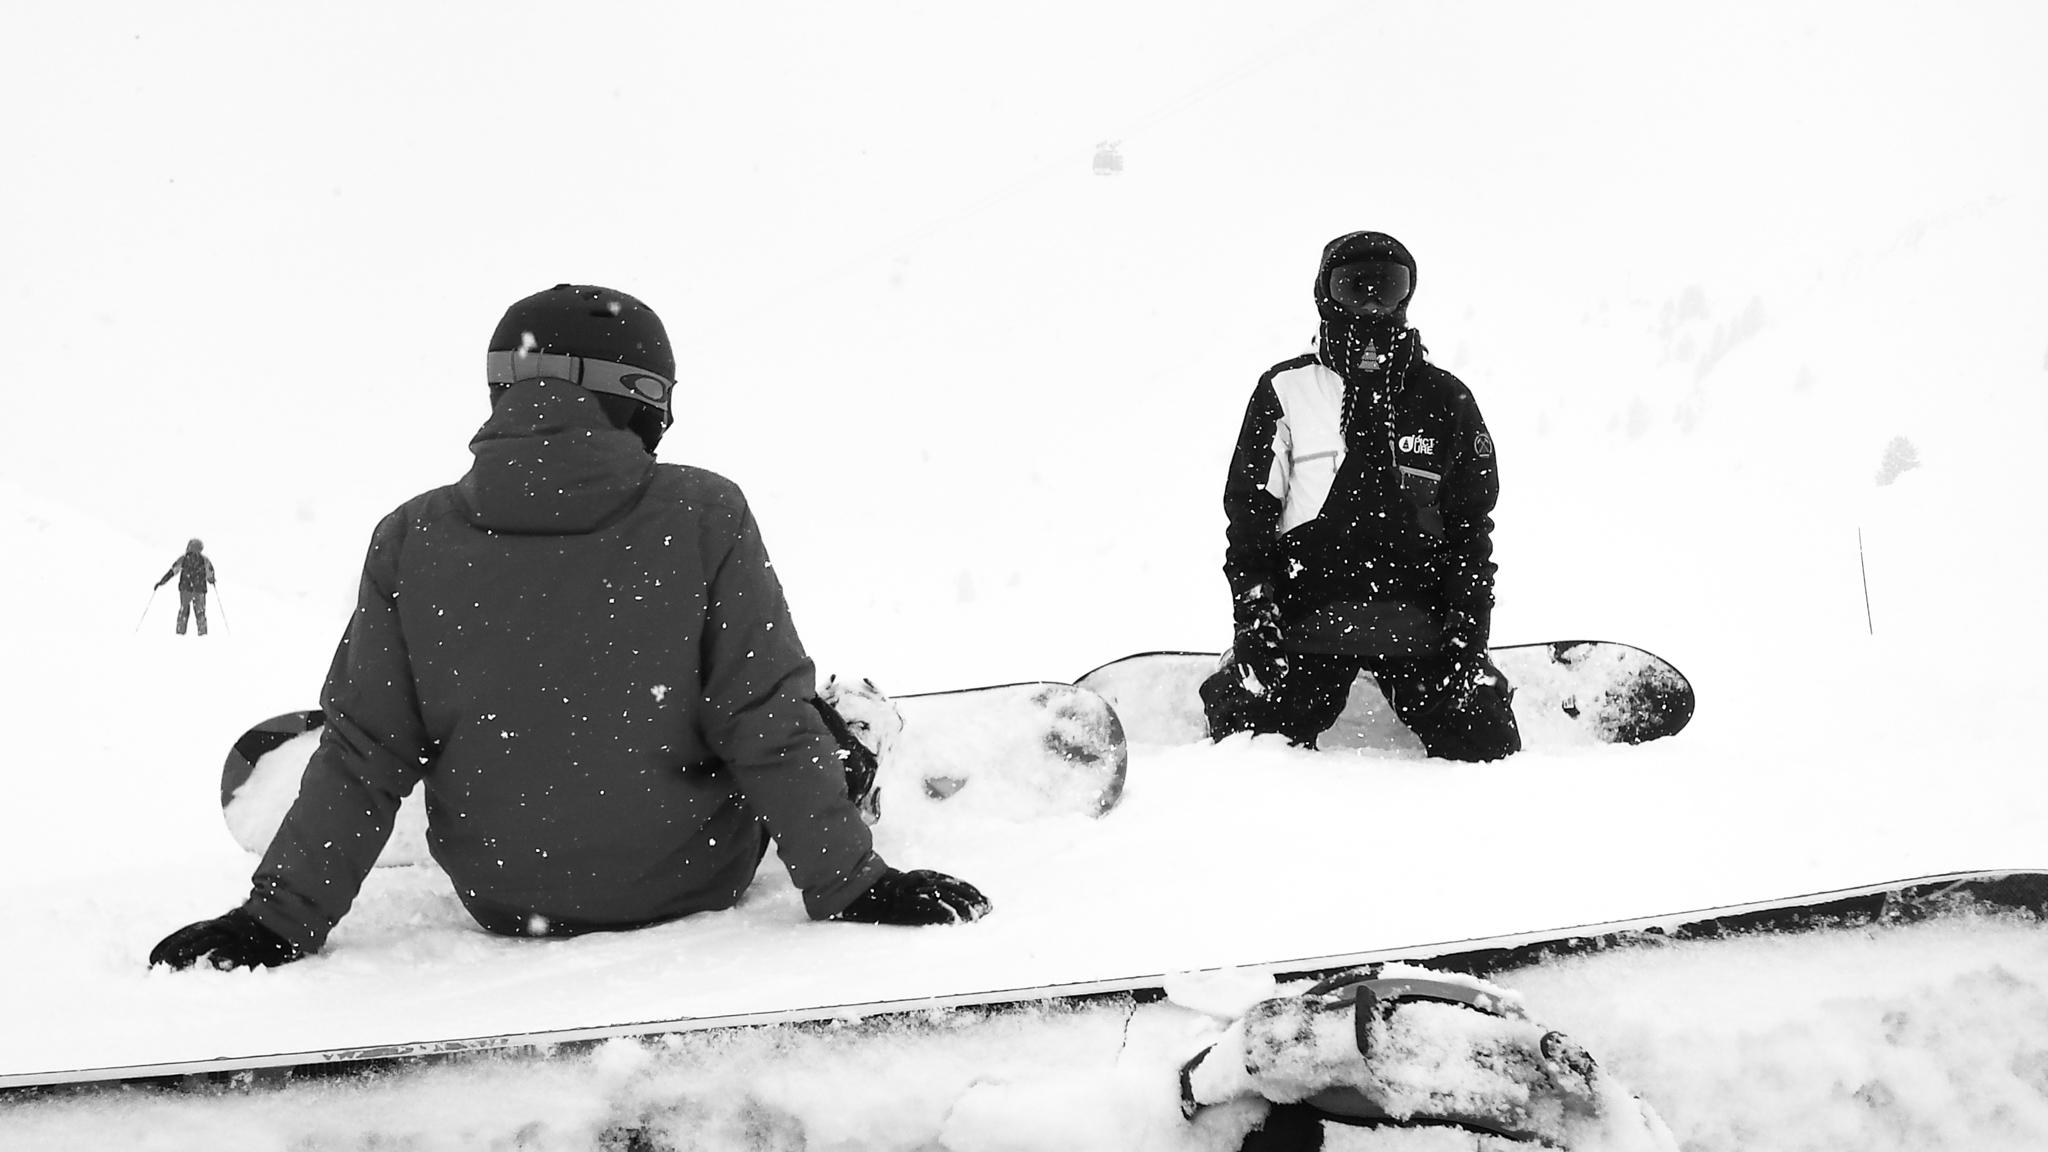 141648-snowboarding-photographer.jpg